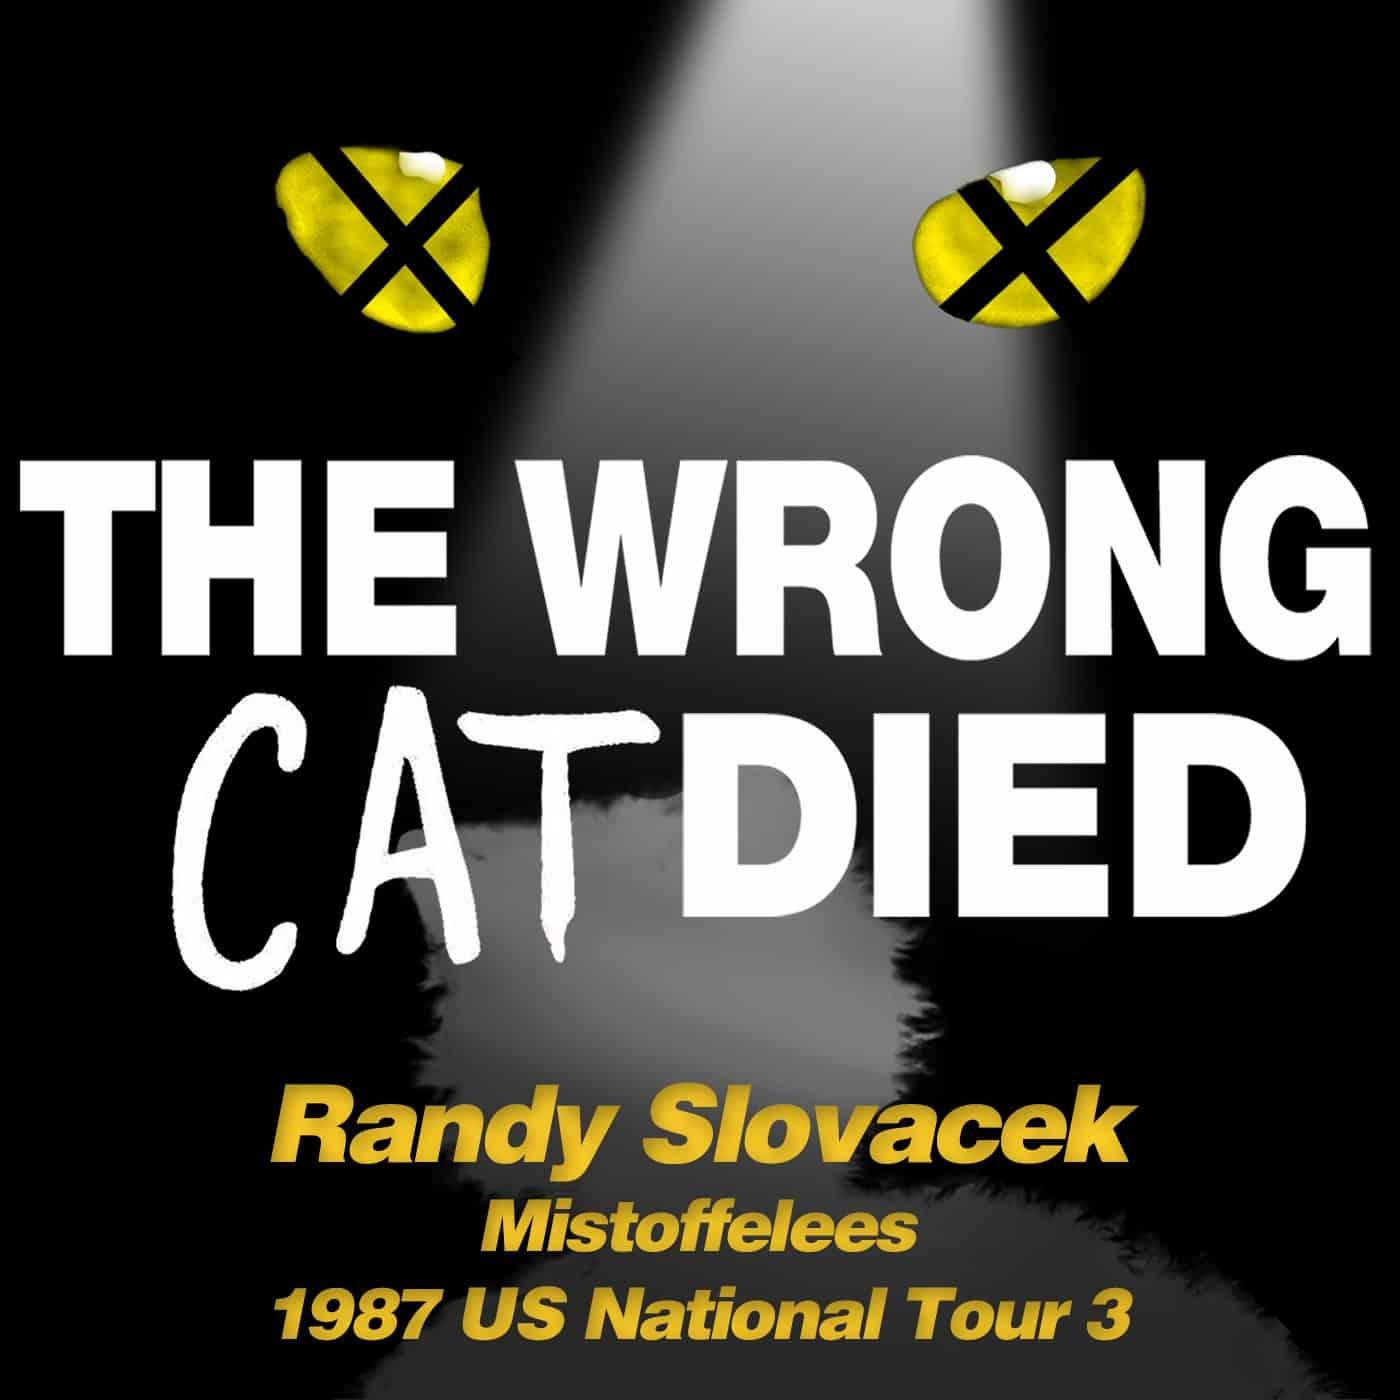 Ep44 - Randy Slovacek, Mistoffelees on 1987 US National Tour 3